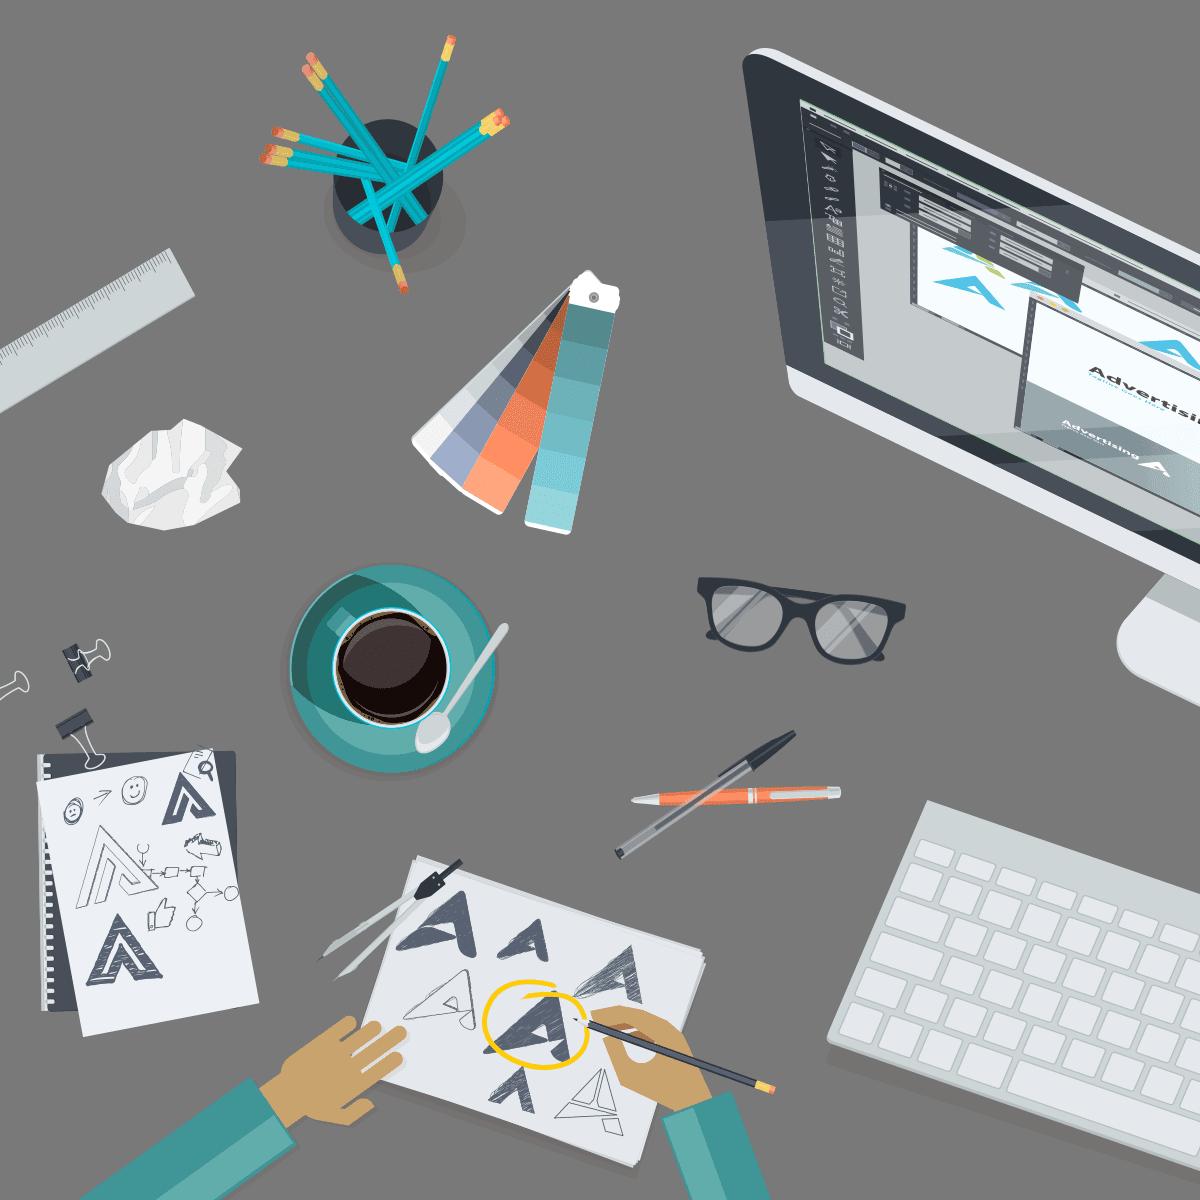 logo designer creating a flexible logo for online use